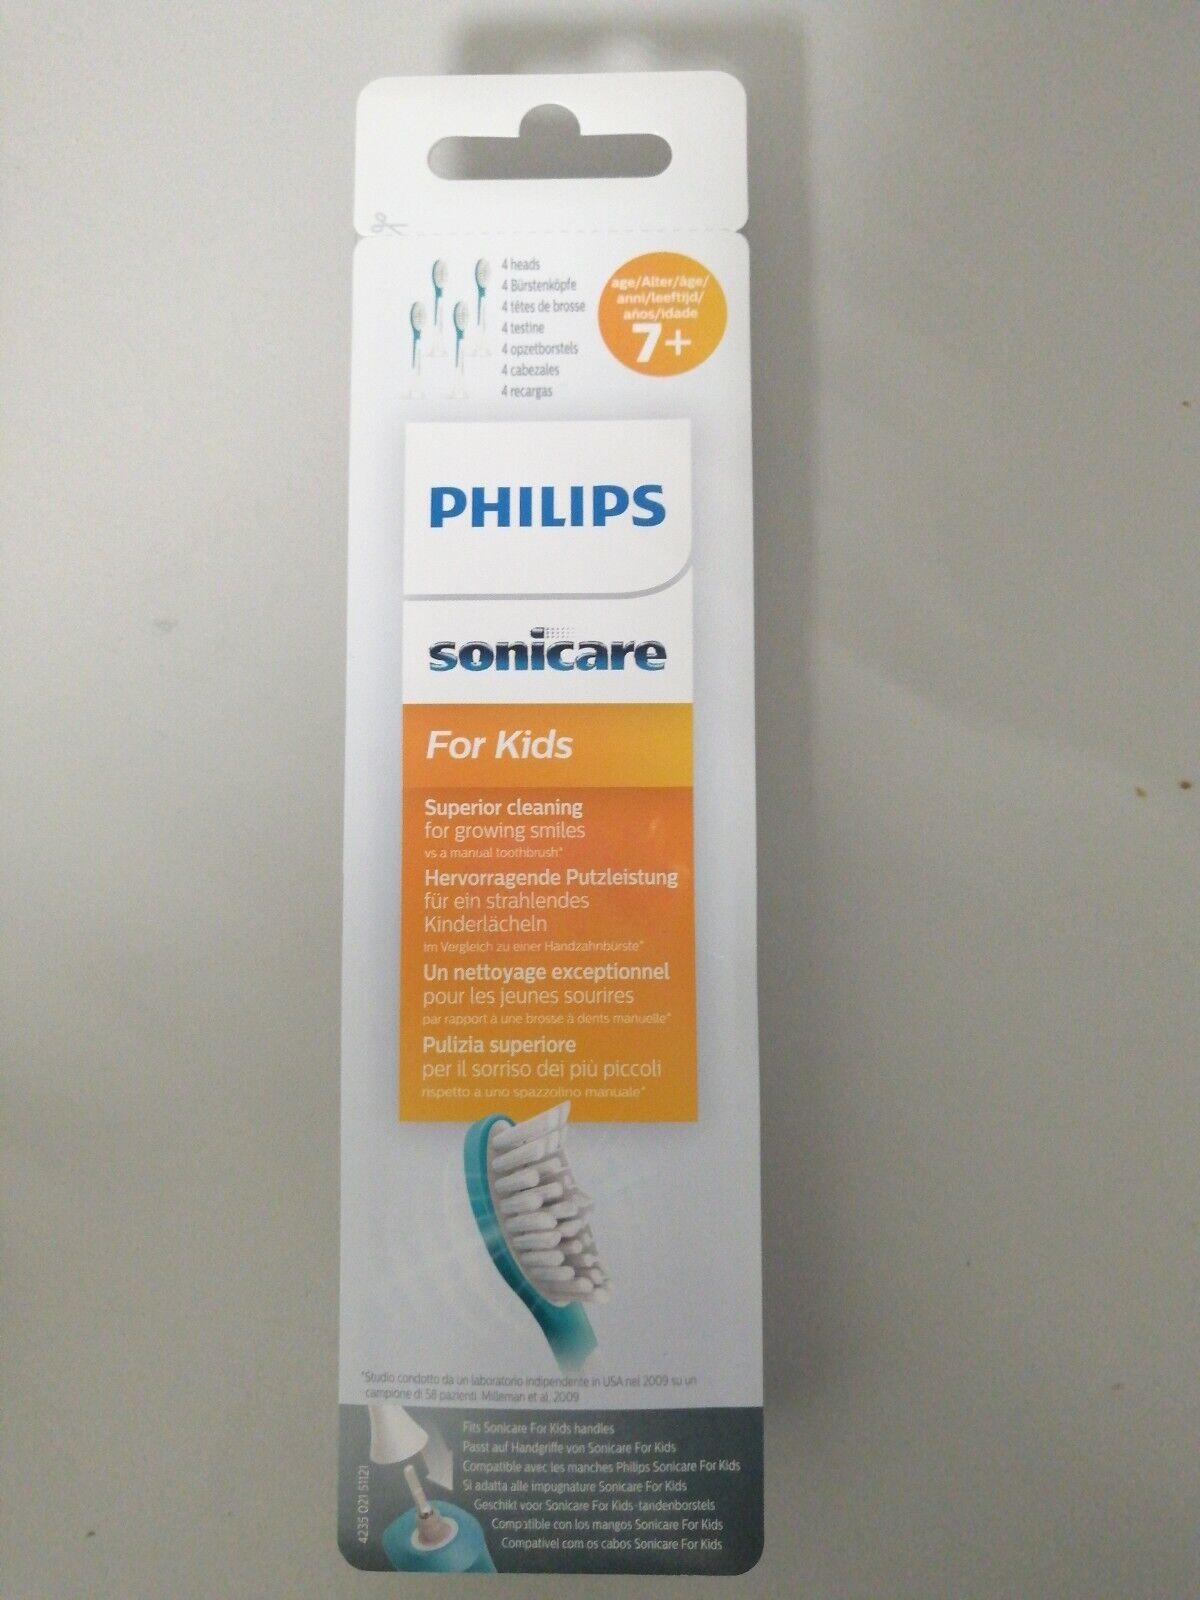 4 Philips Sonicare For Kids Hx604433 Bürstenköpfe Kinder 7 Jahre